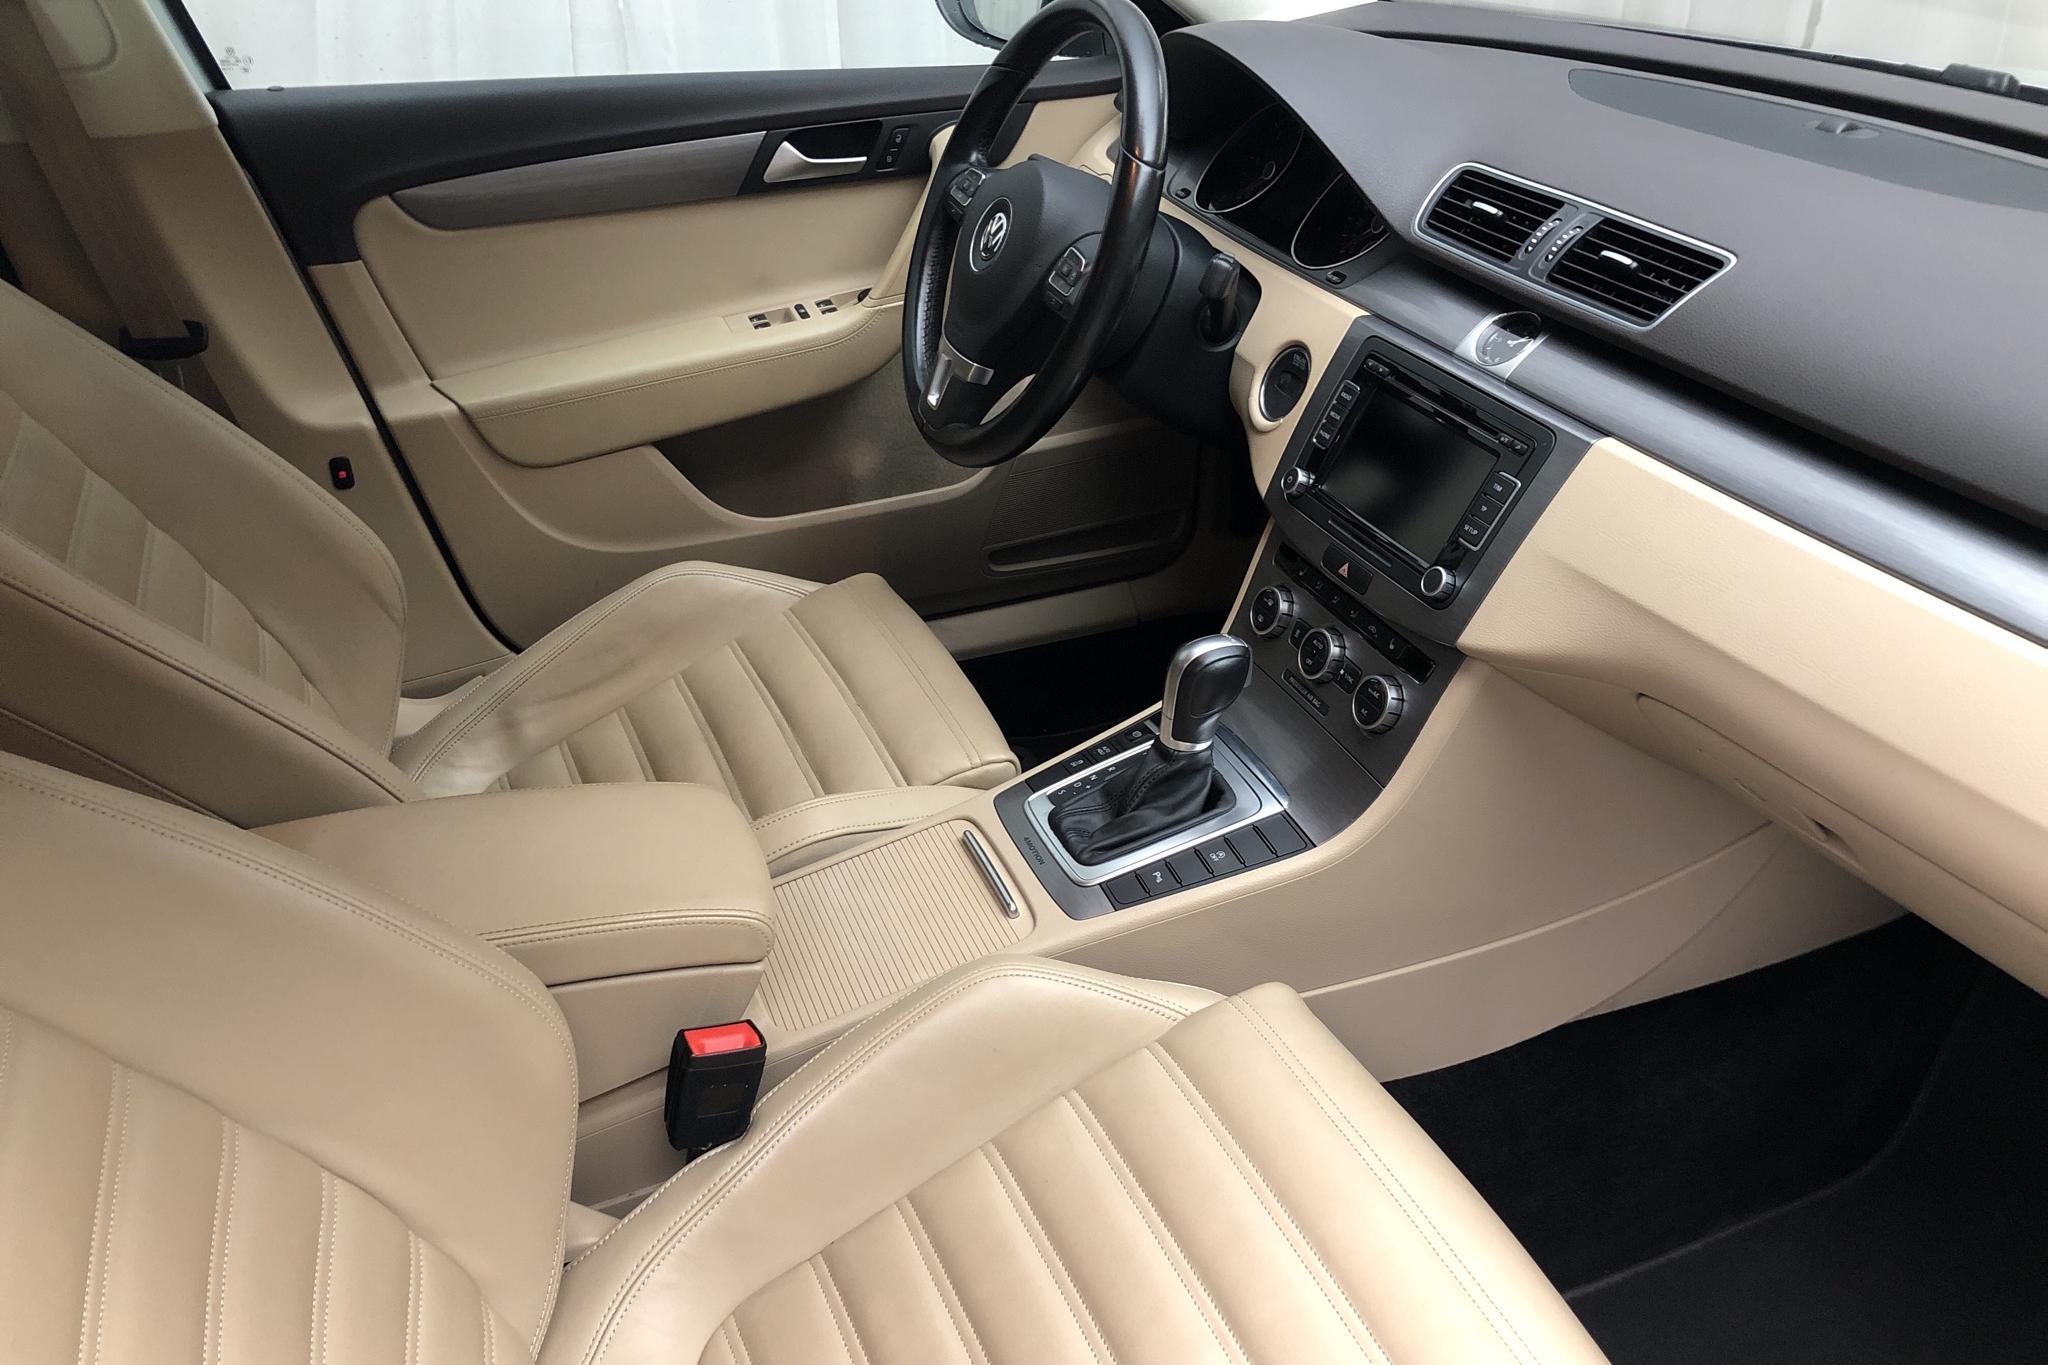 VW Passat 2.0 TDI BlueMotion Technology Variant 4Motion (177hk) - 203 890 km - Automatic - silver - 2015